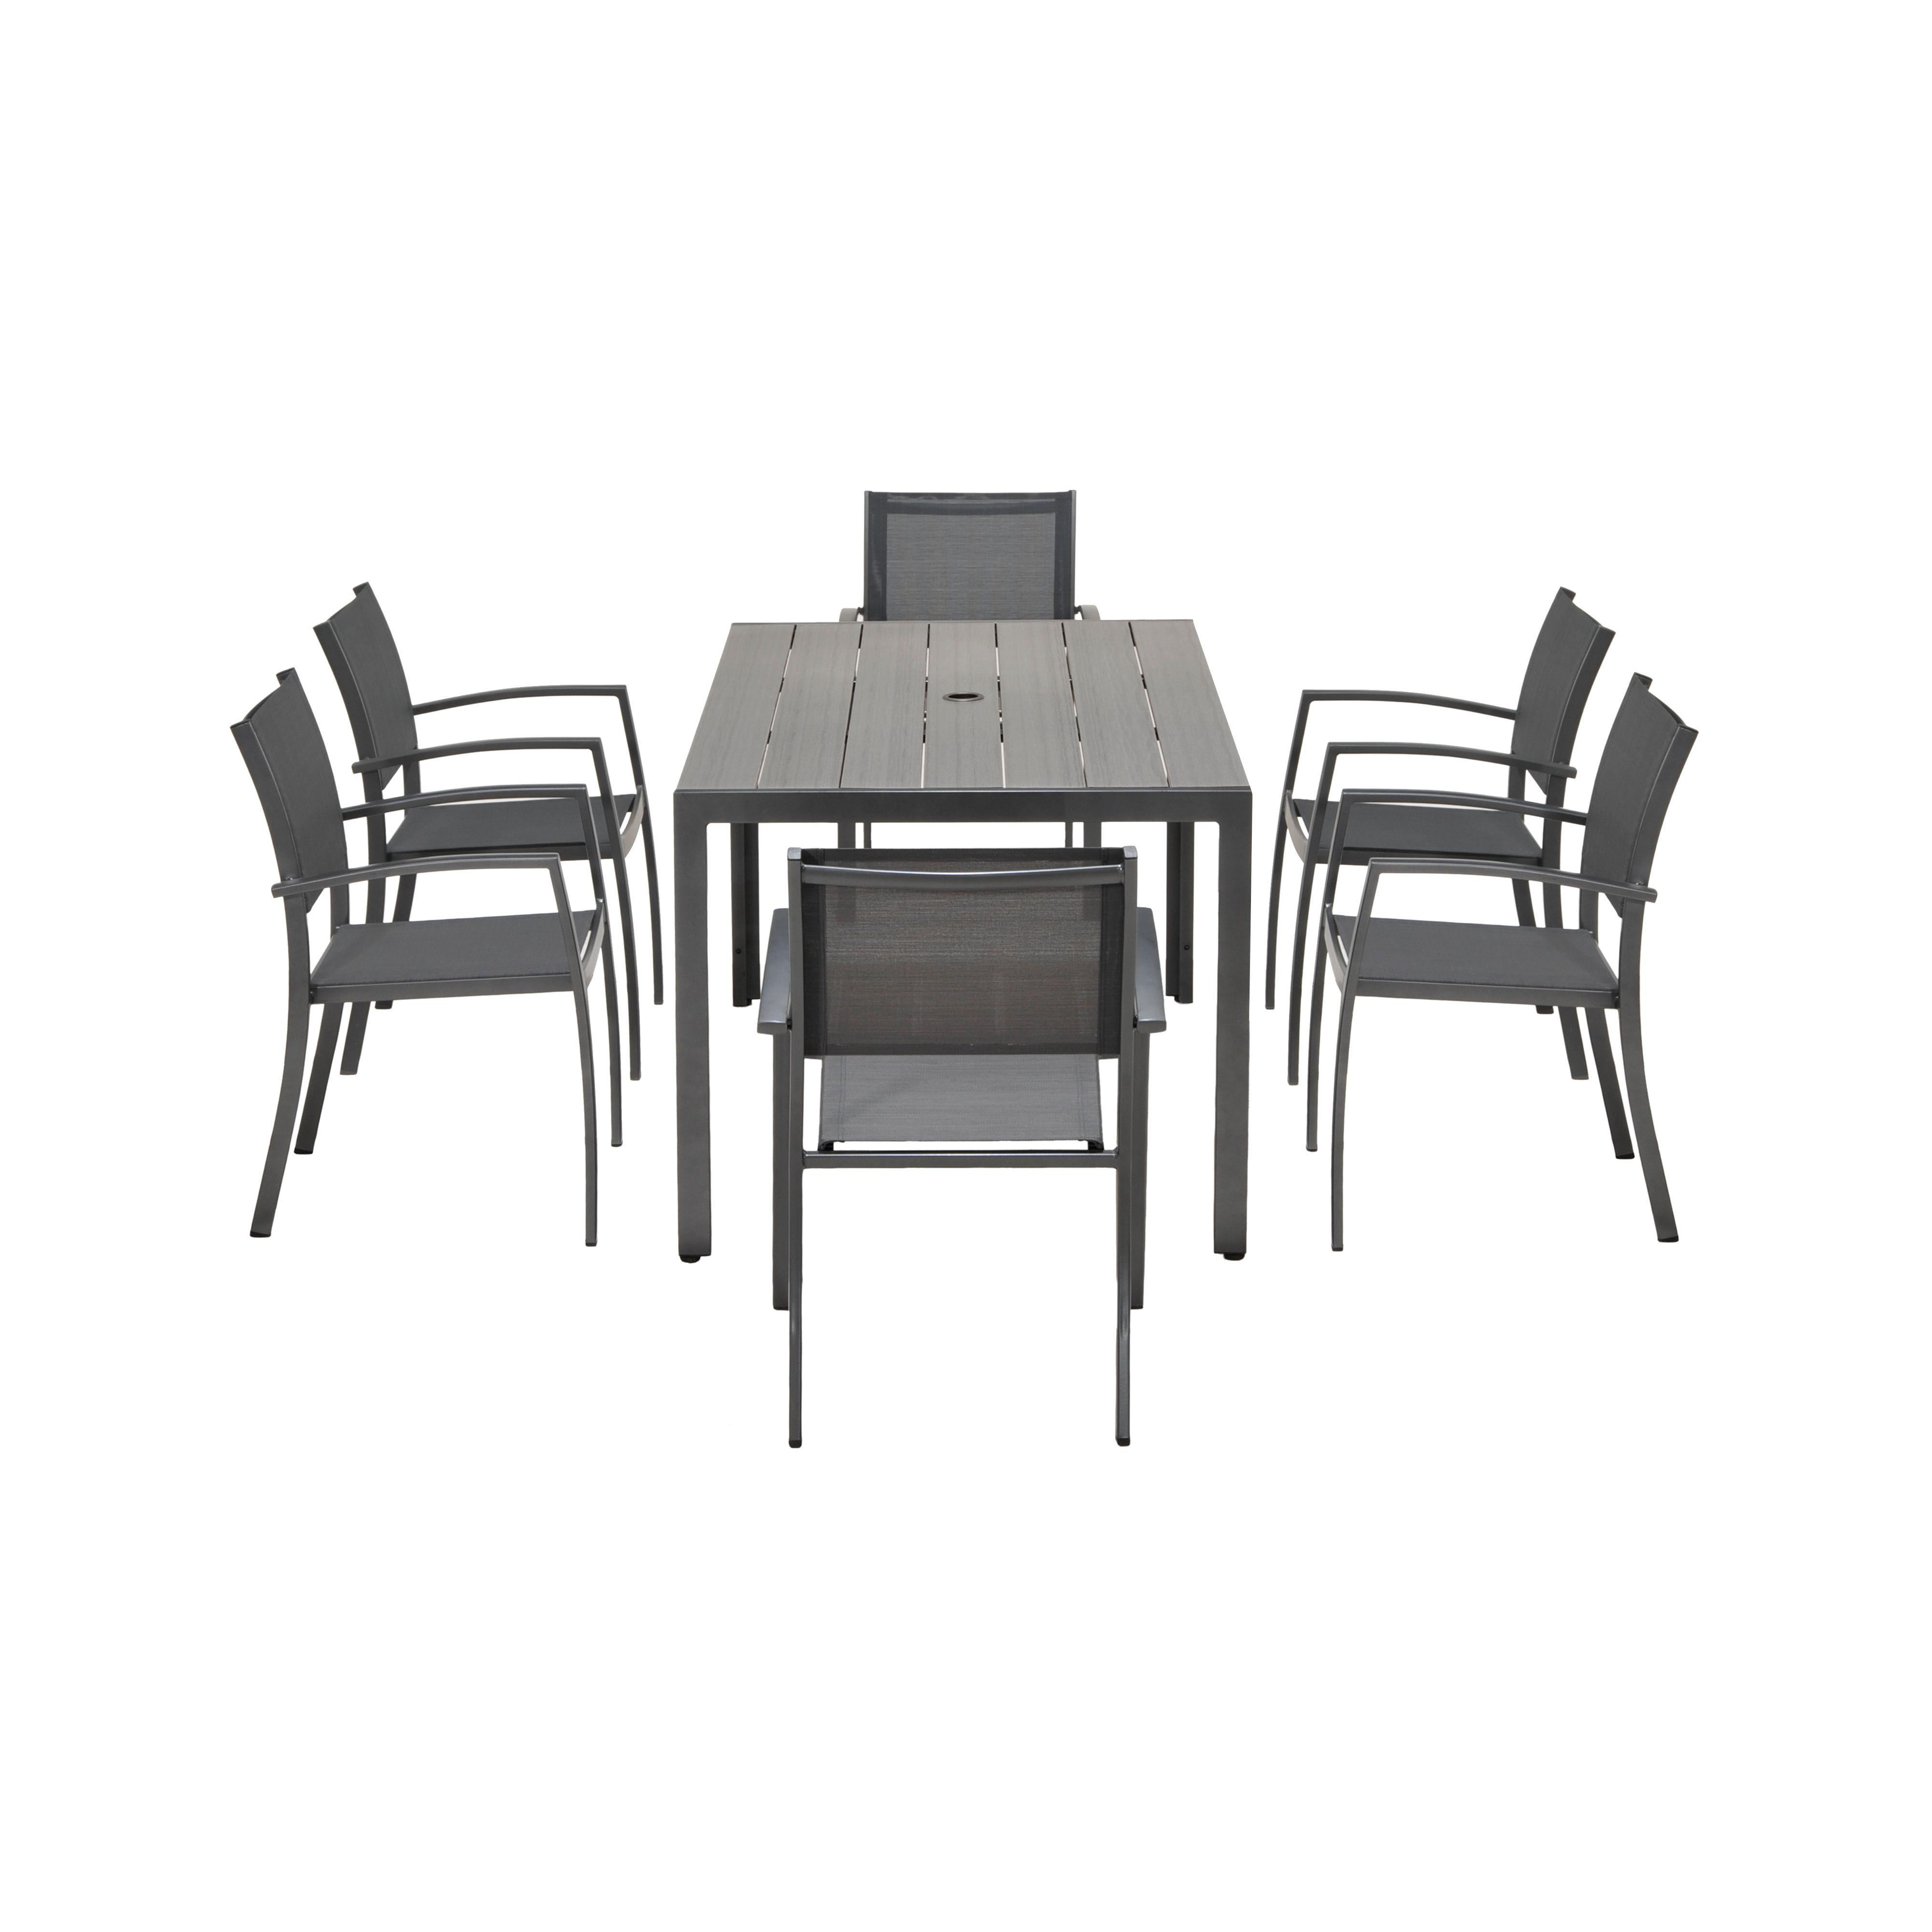 Halden Aluminium & Duraboard 7 Seater Garden Furniture Set - Graphite